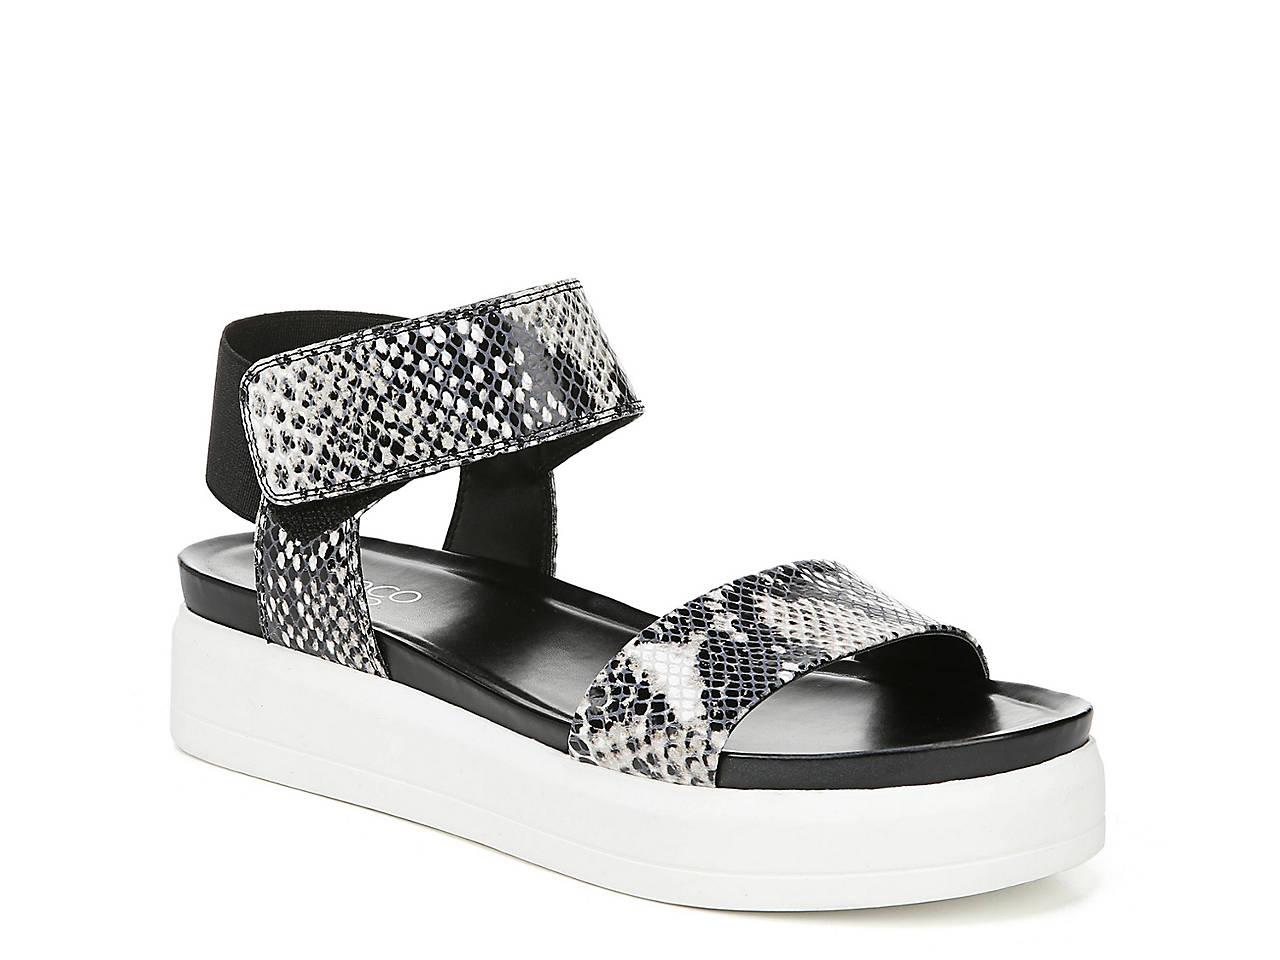 6c027a980b845 Franco Sarto Kana Platform Sandal Women's Shoes | DSW